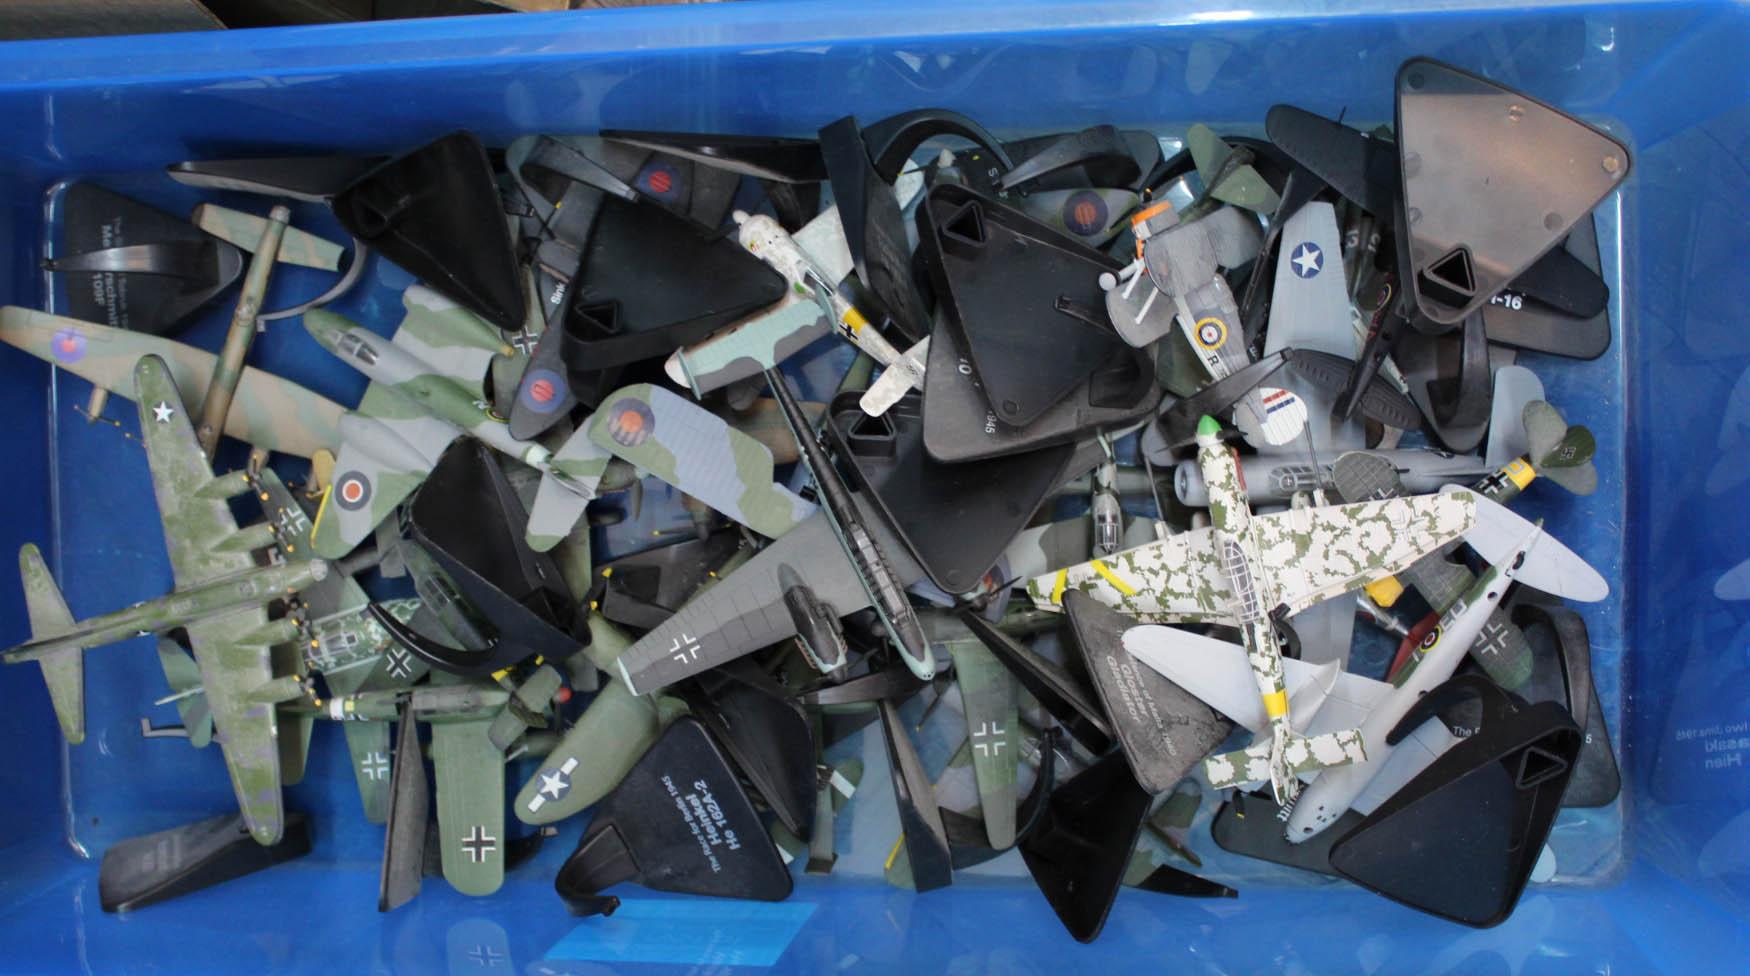 Lot 26 - A quantity of die cast model aircraft